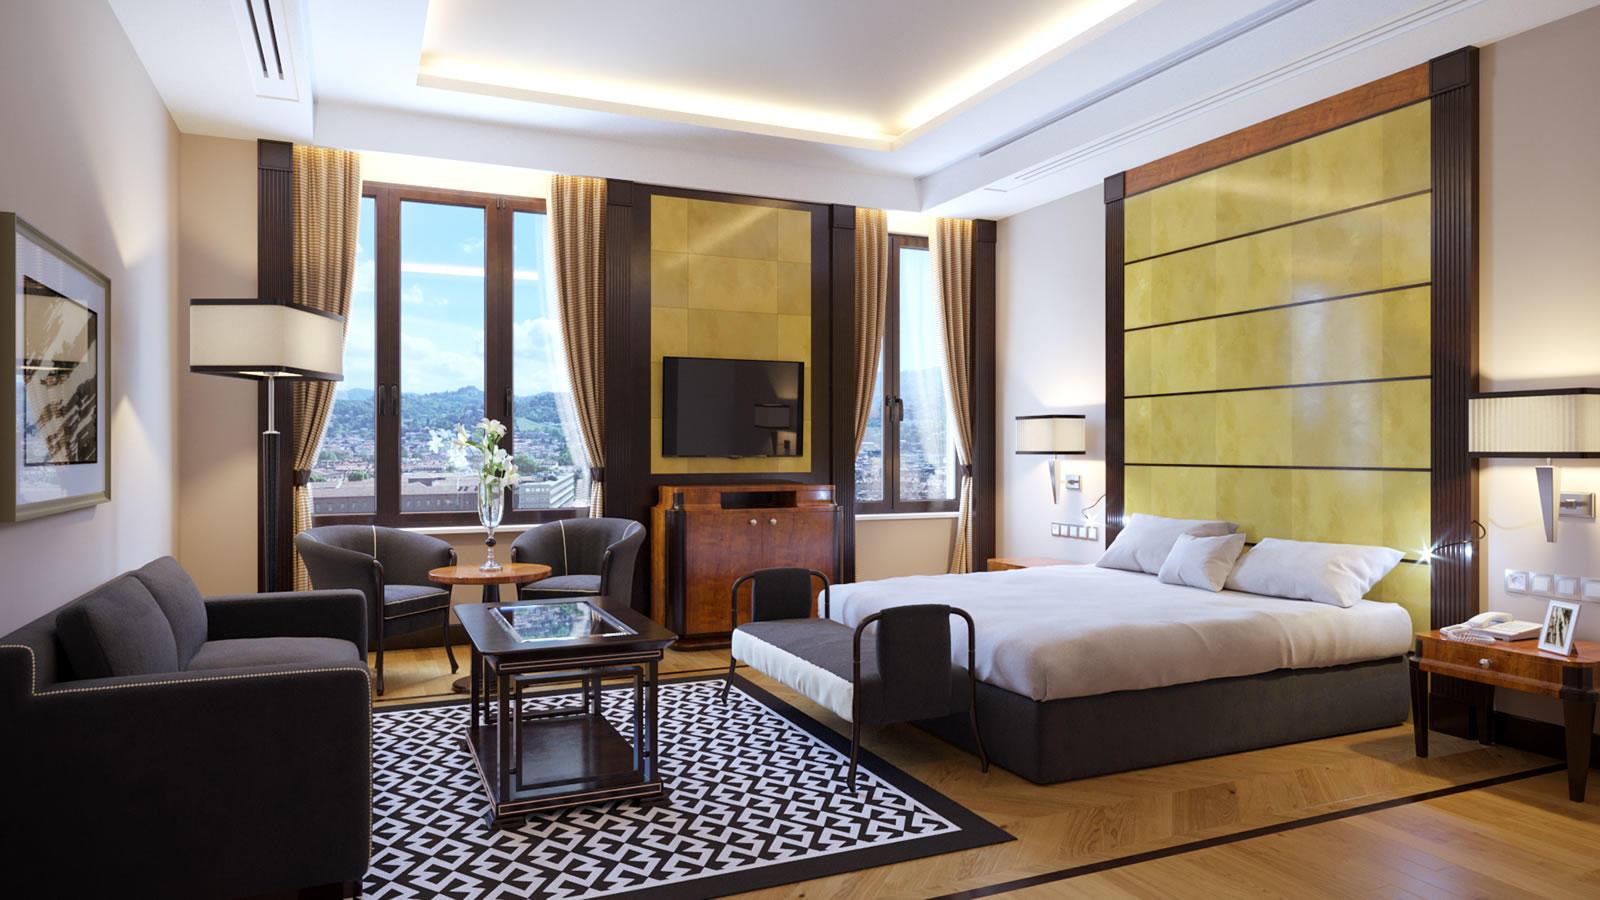 Junior Suite with View | Principi Di Piemonte